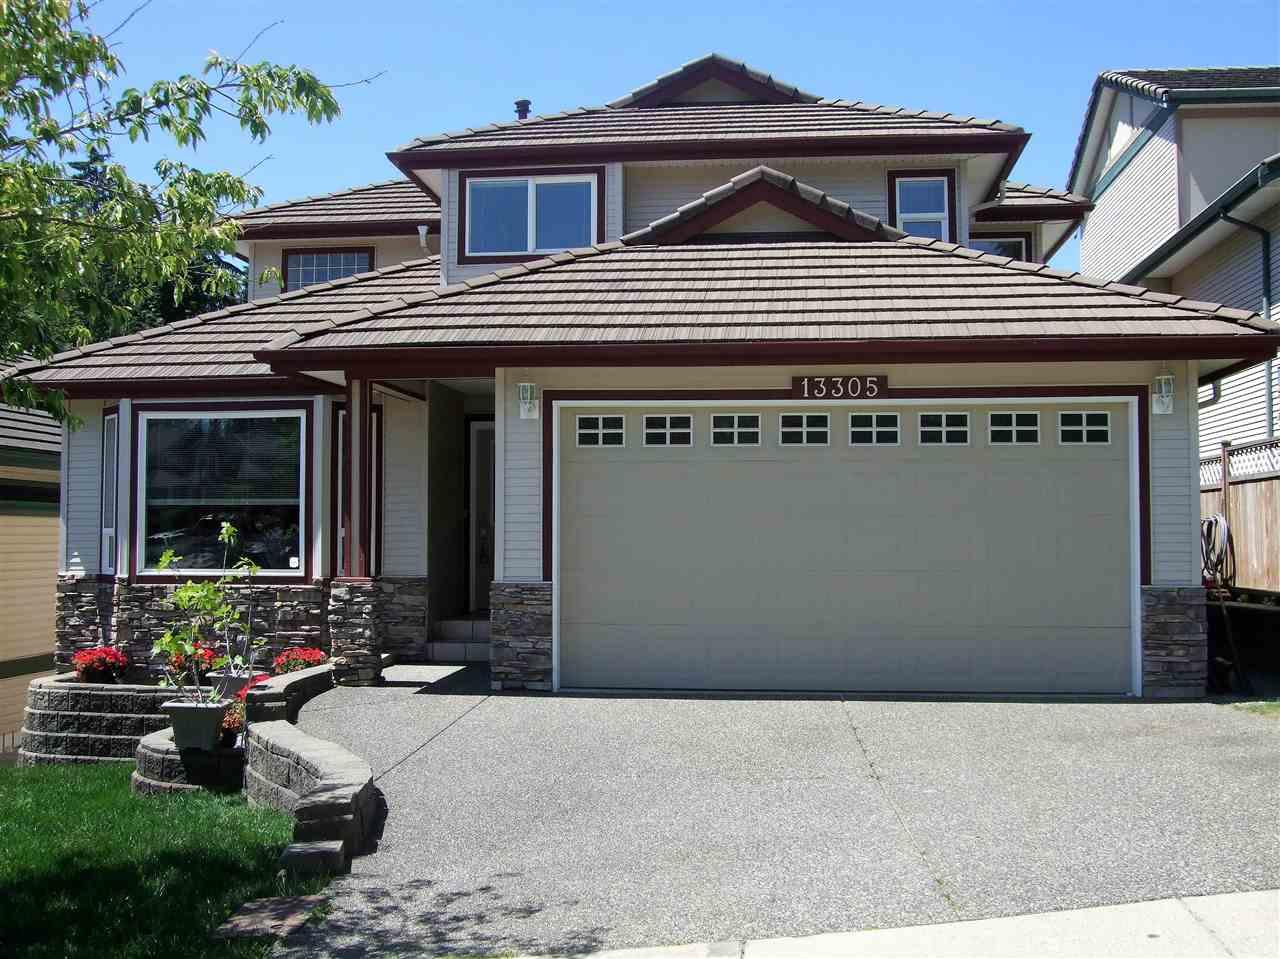 13305 237A STREET, Maple Ridge, BC, V4R 2T9 Primary Photo